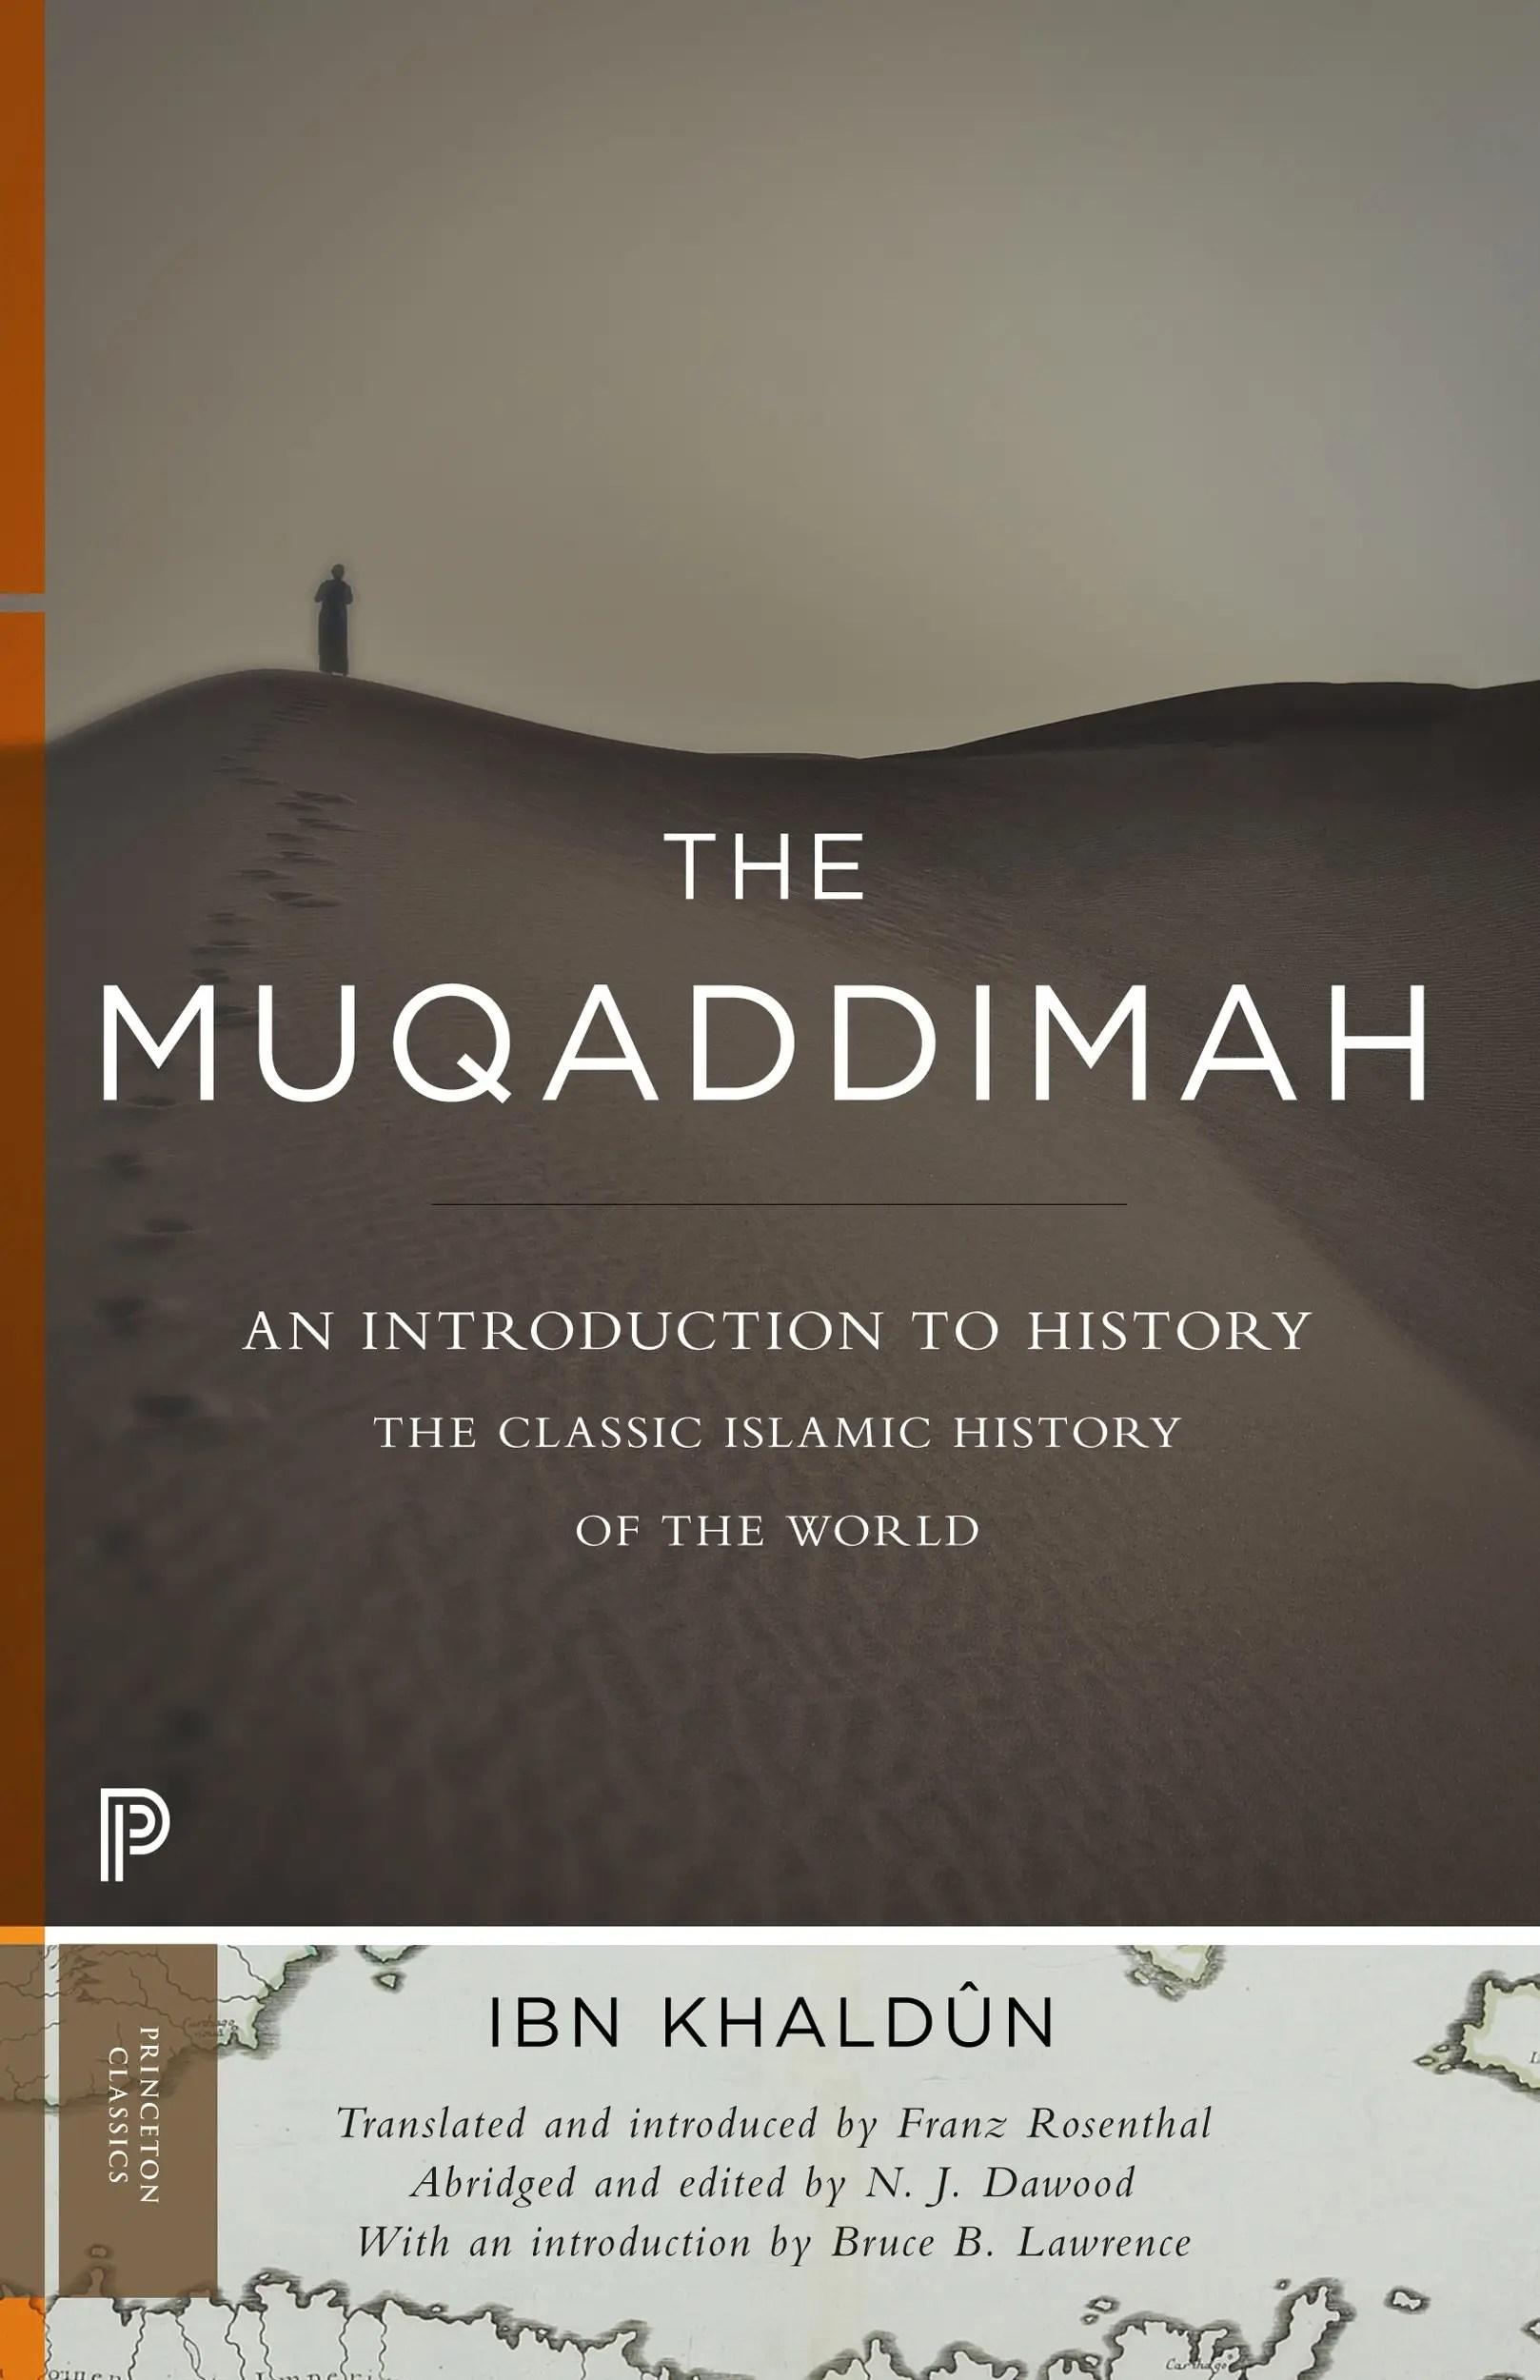 Why Mark Zuckerberg wants everyone to read 14thcentury Islamic book The Muqaddimah  Business